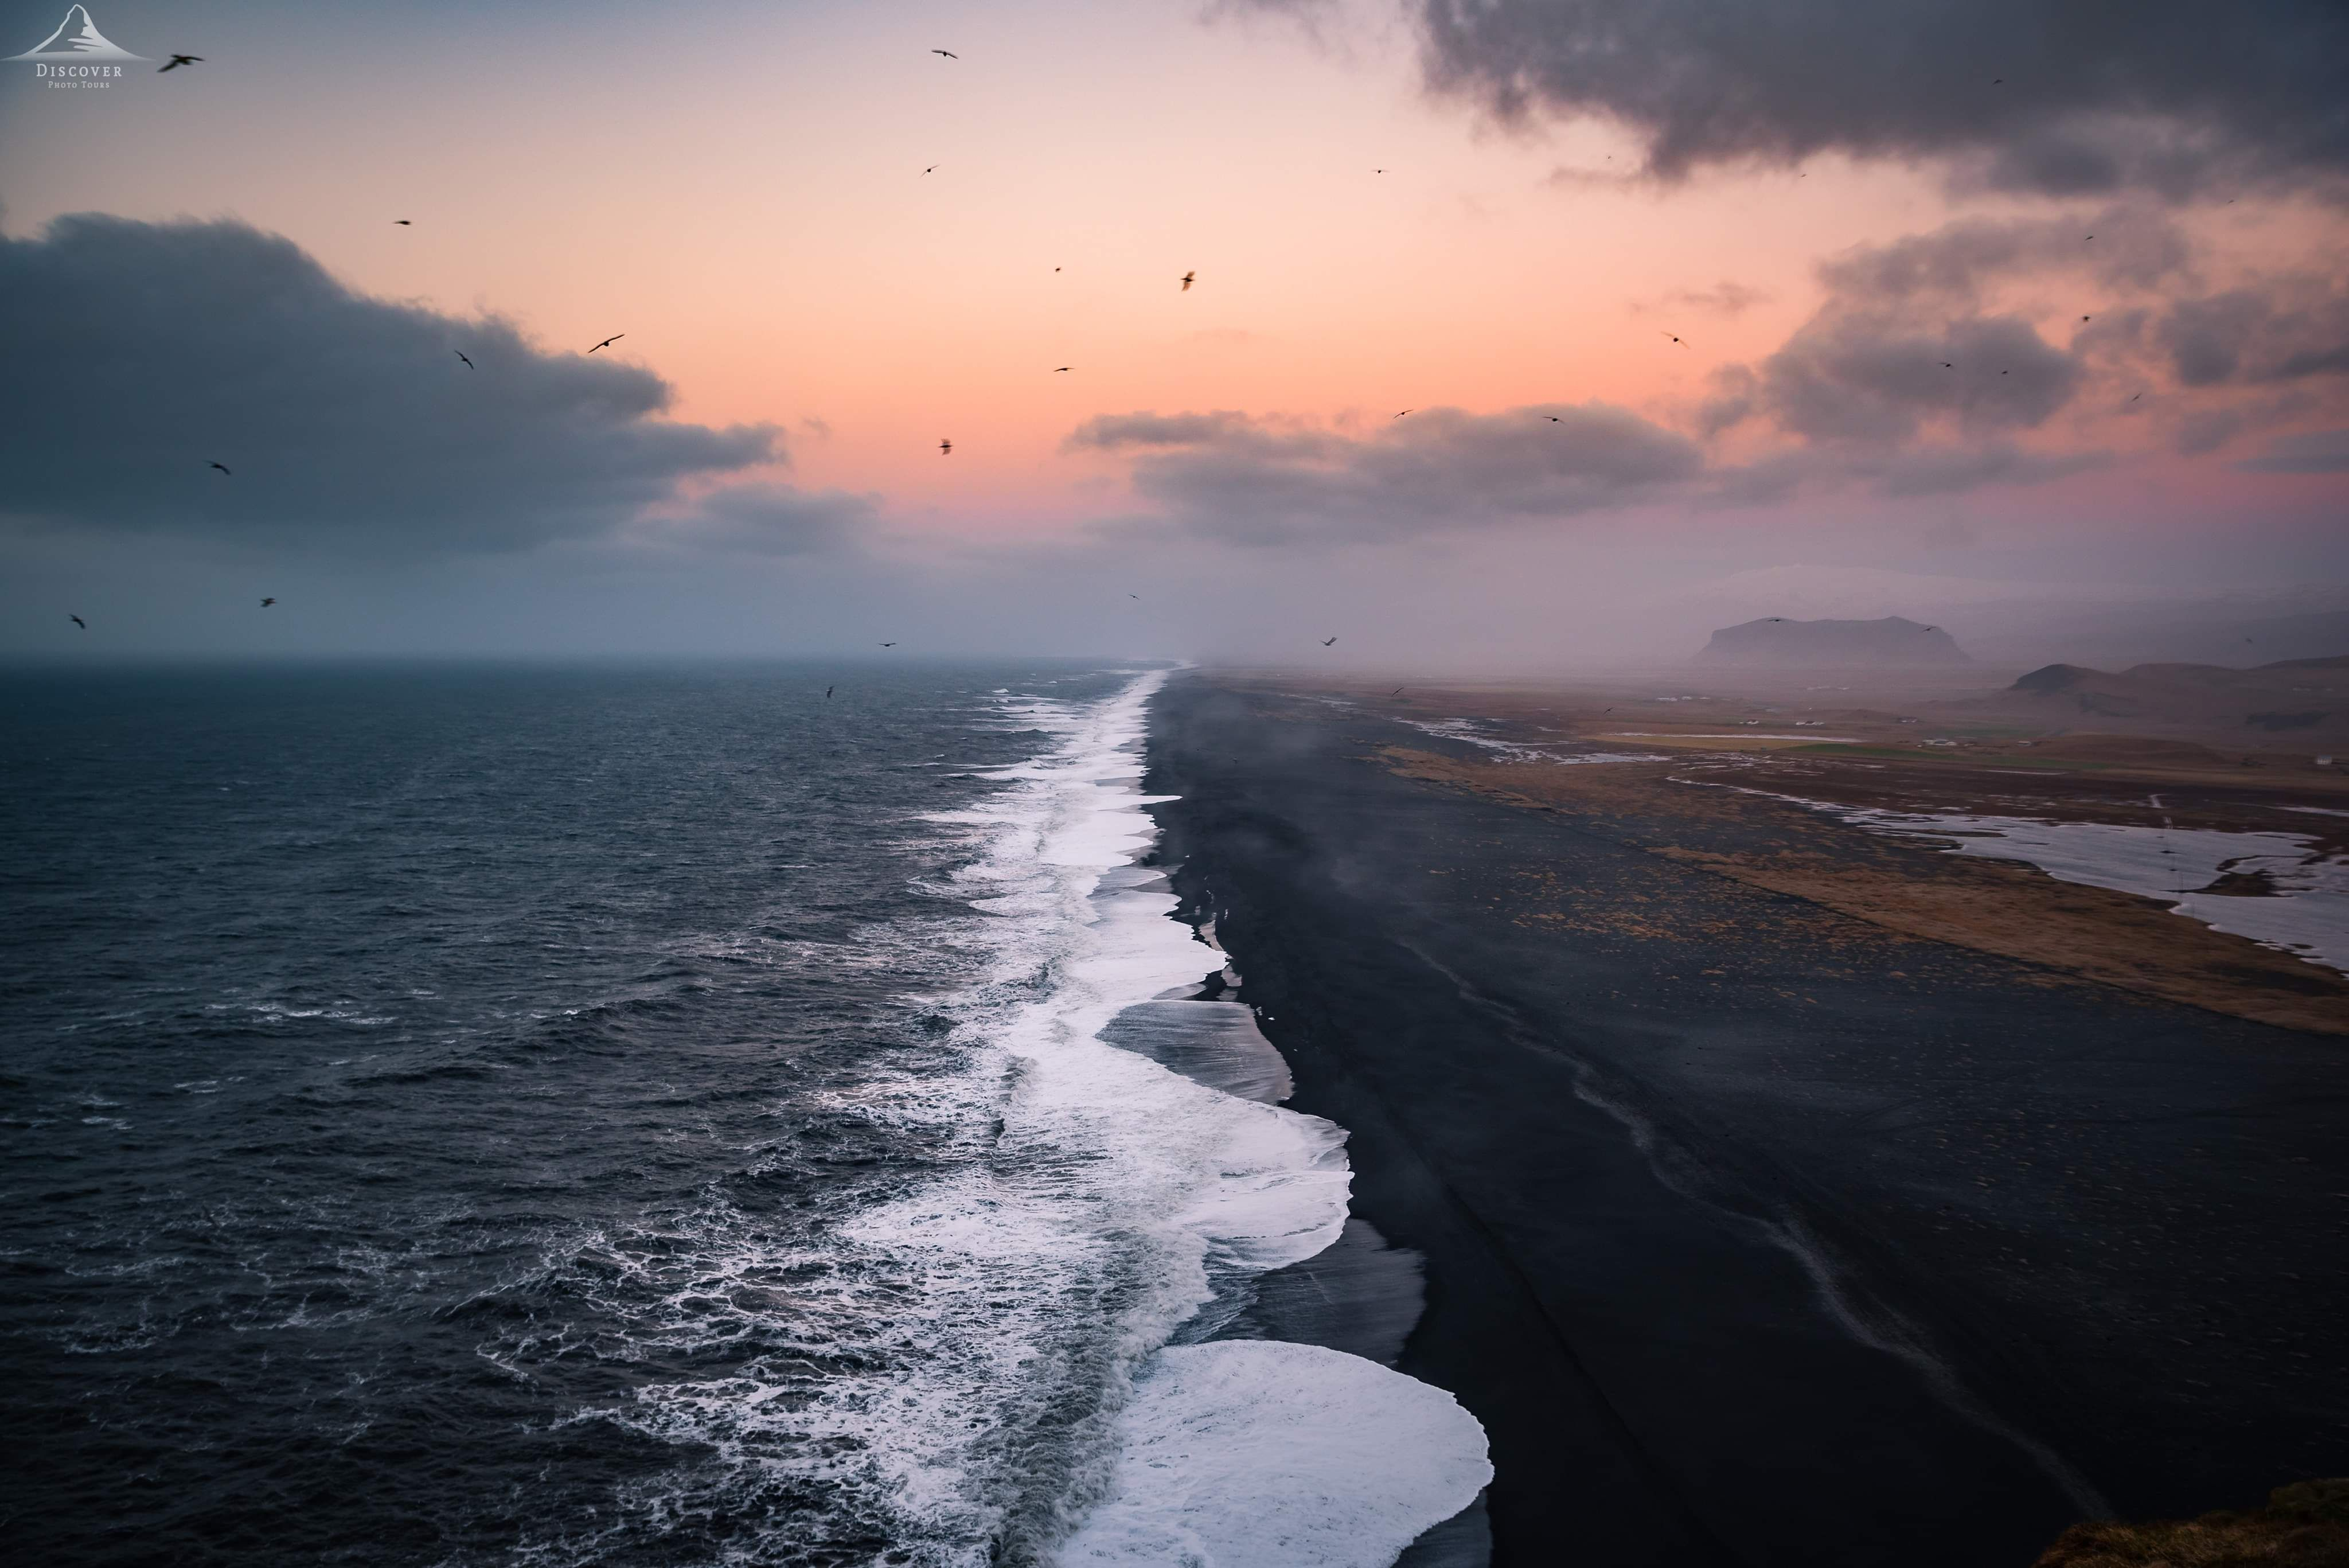 Black Sand Beach At Sunset Iceland In 2020 Black Sand Beach Black Sand Beach Iceland Iceland Black Sand